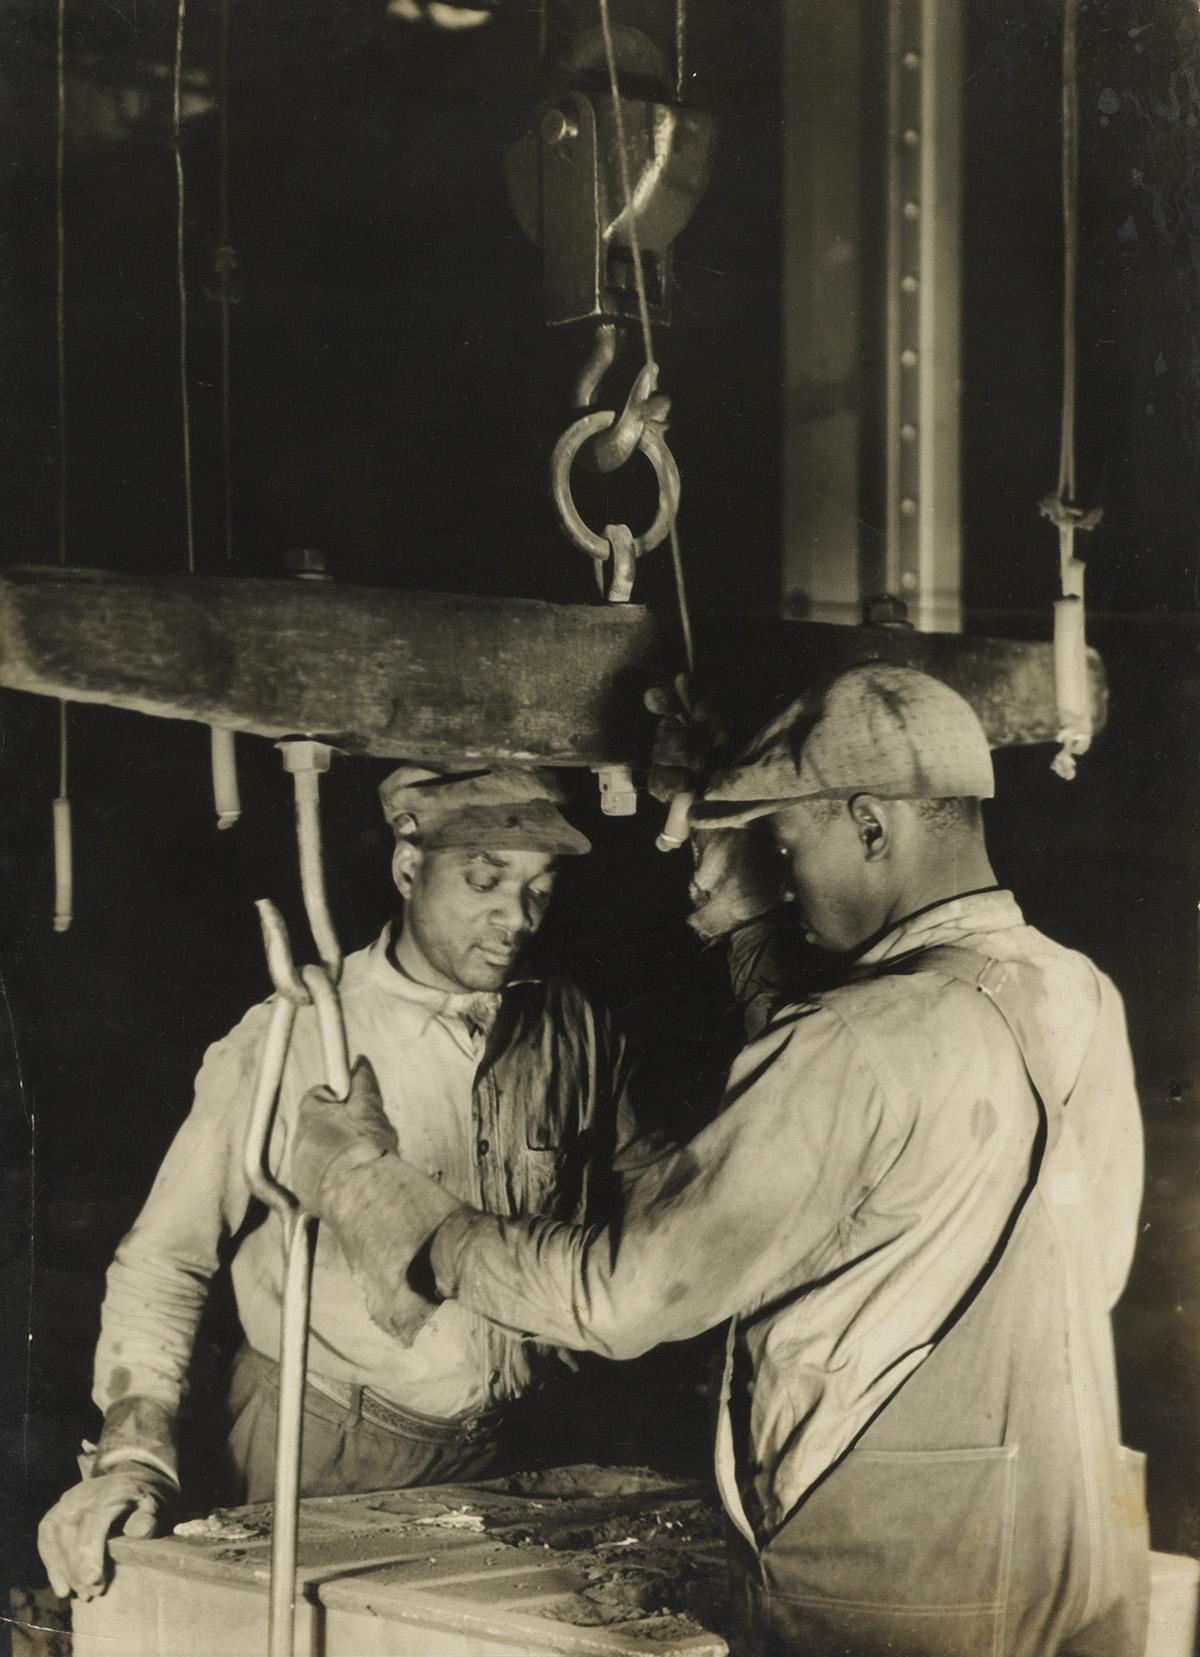 MARGARET-BOURKE-WHITE-(1904-1971)-Aluminum-Company-of-Americ